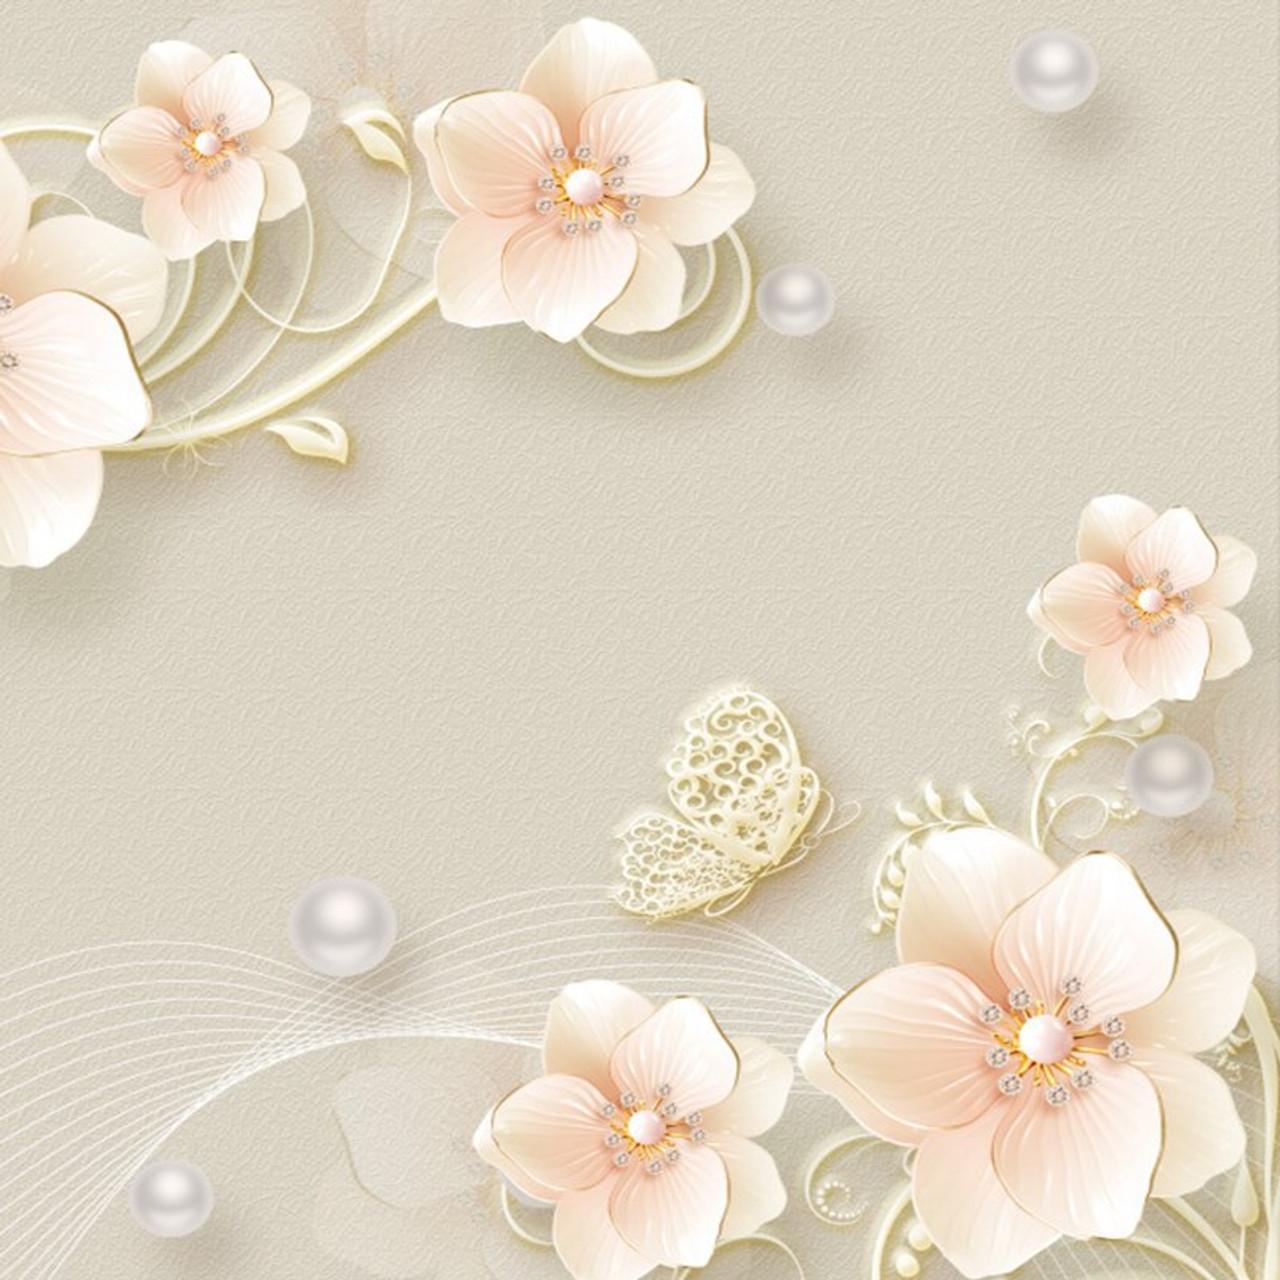 Custom Mural Wallpaper 3d Stereo Relief Jewelry Flower Modern